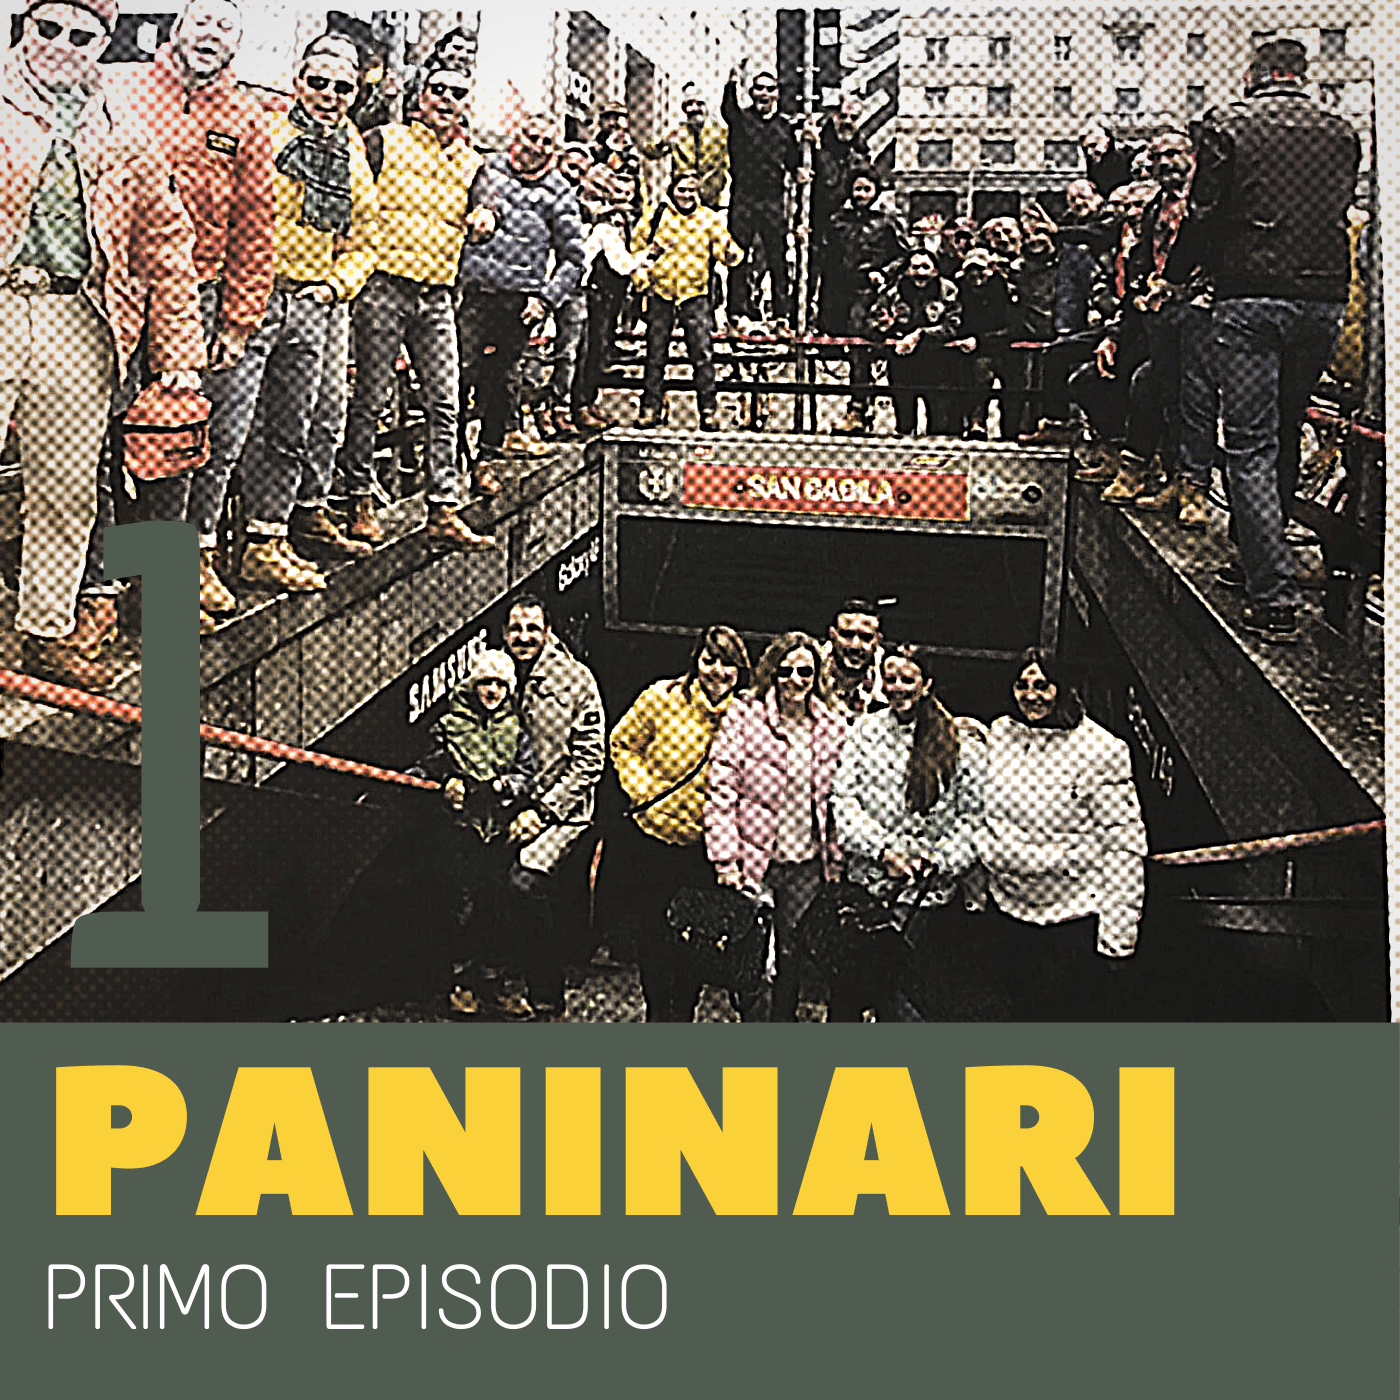 Paninari Podcast episodio 1